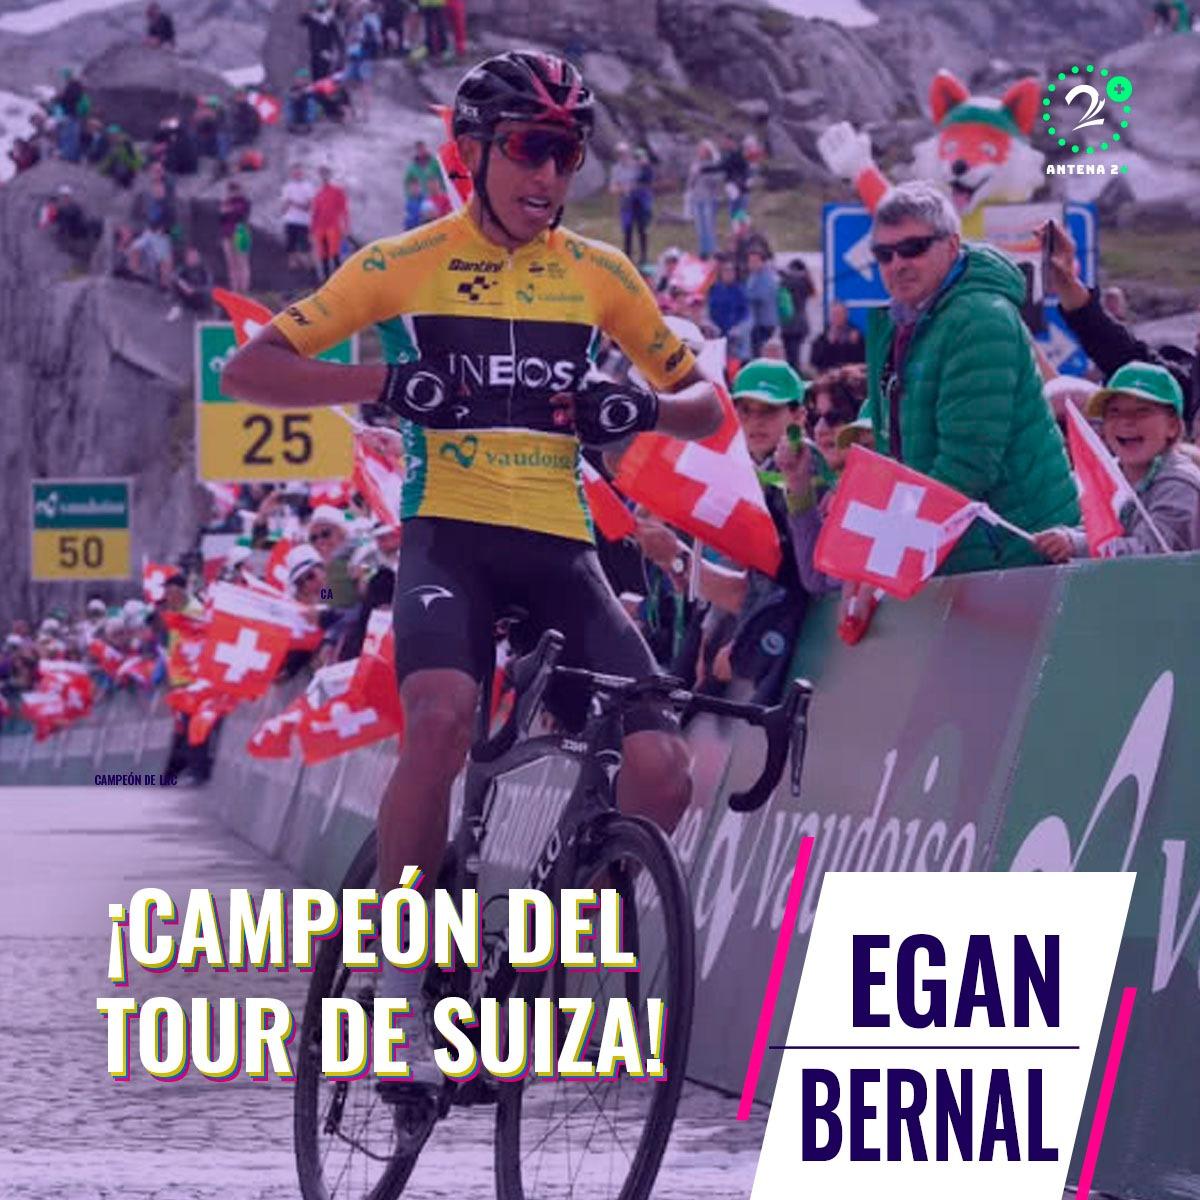 Egan Bernal campeón de la Vuelta a Suiza